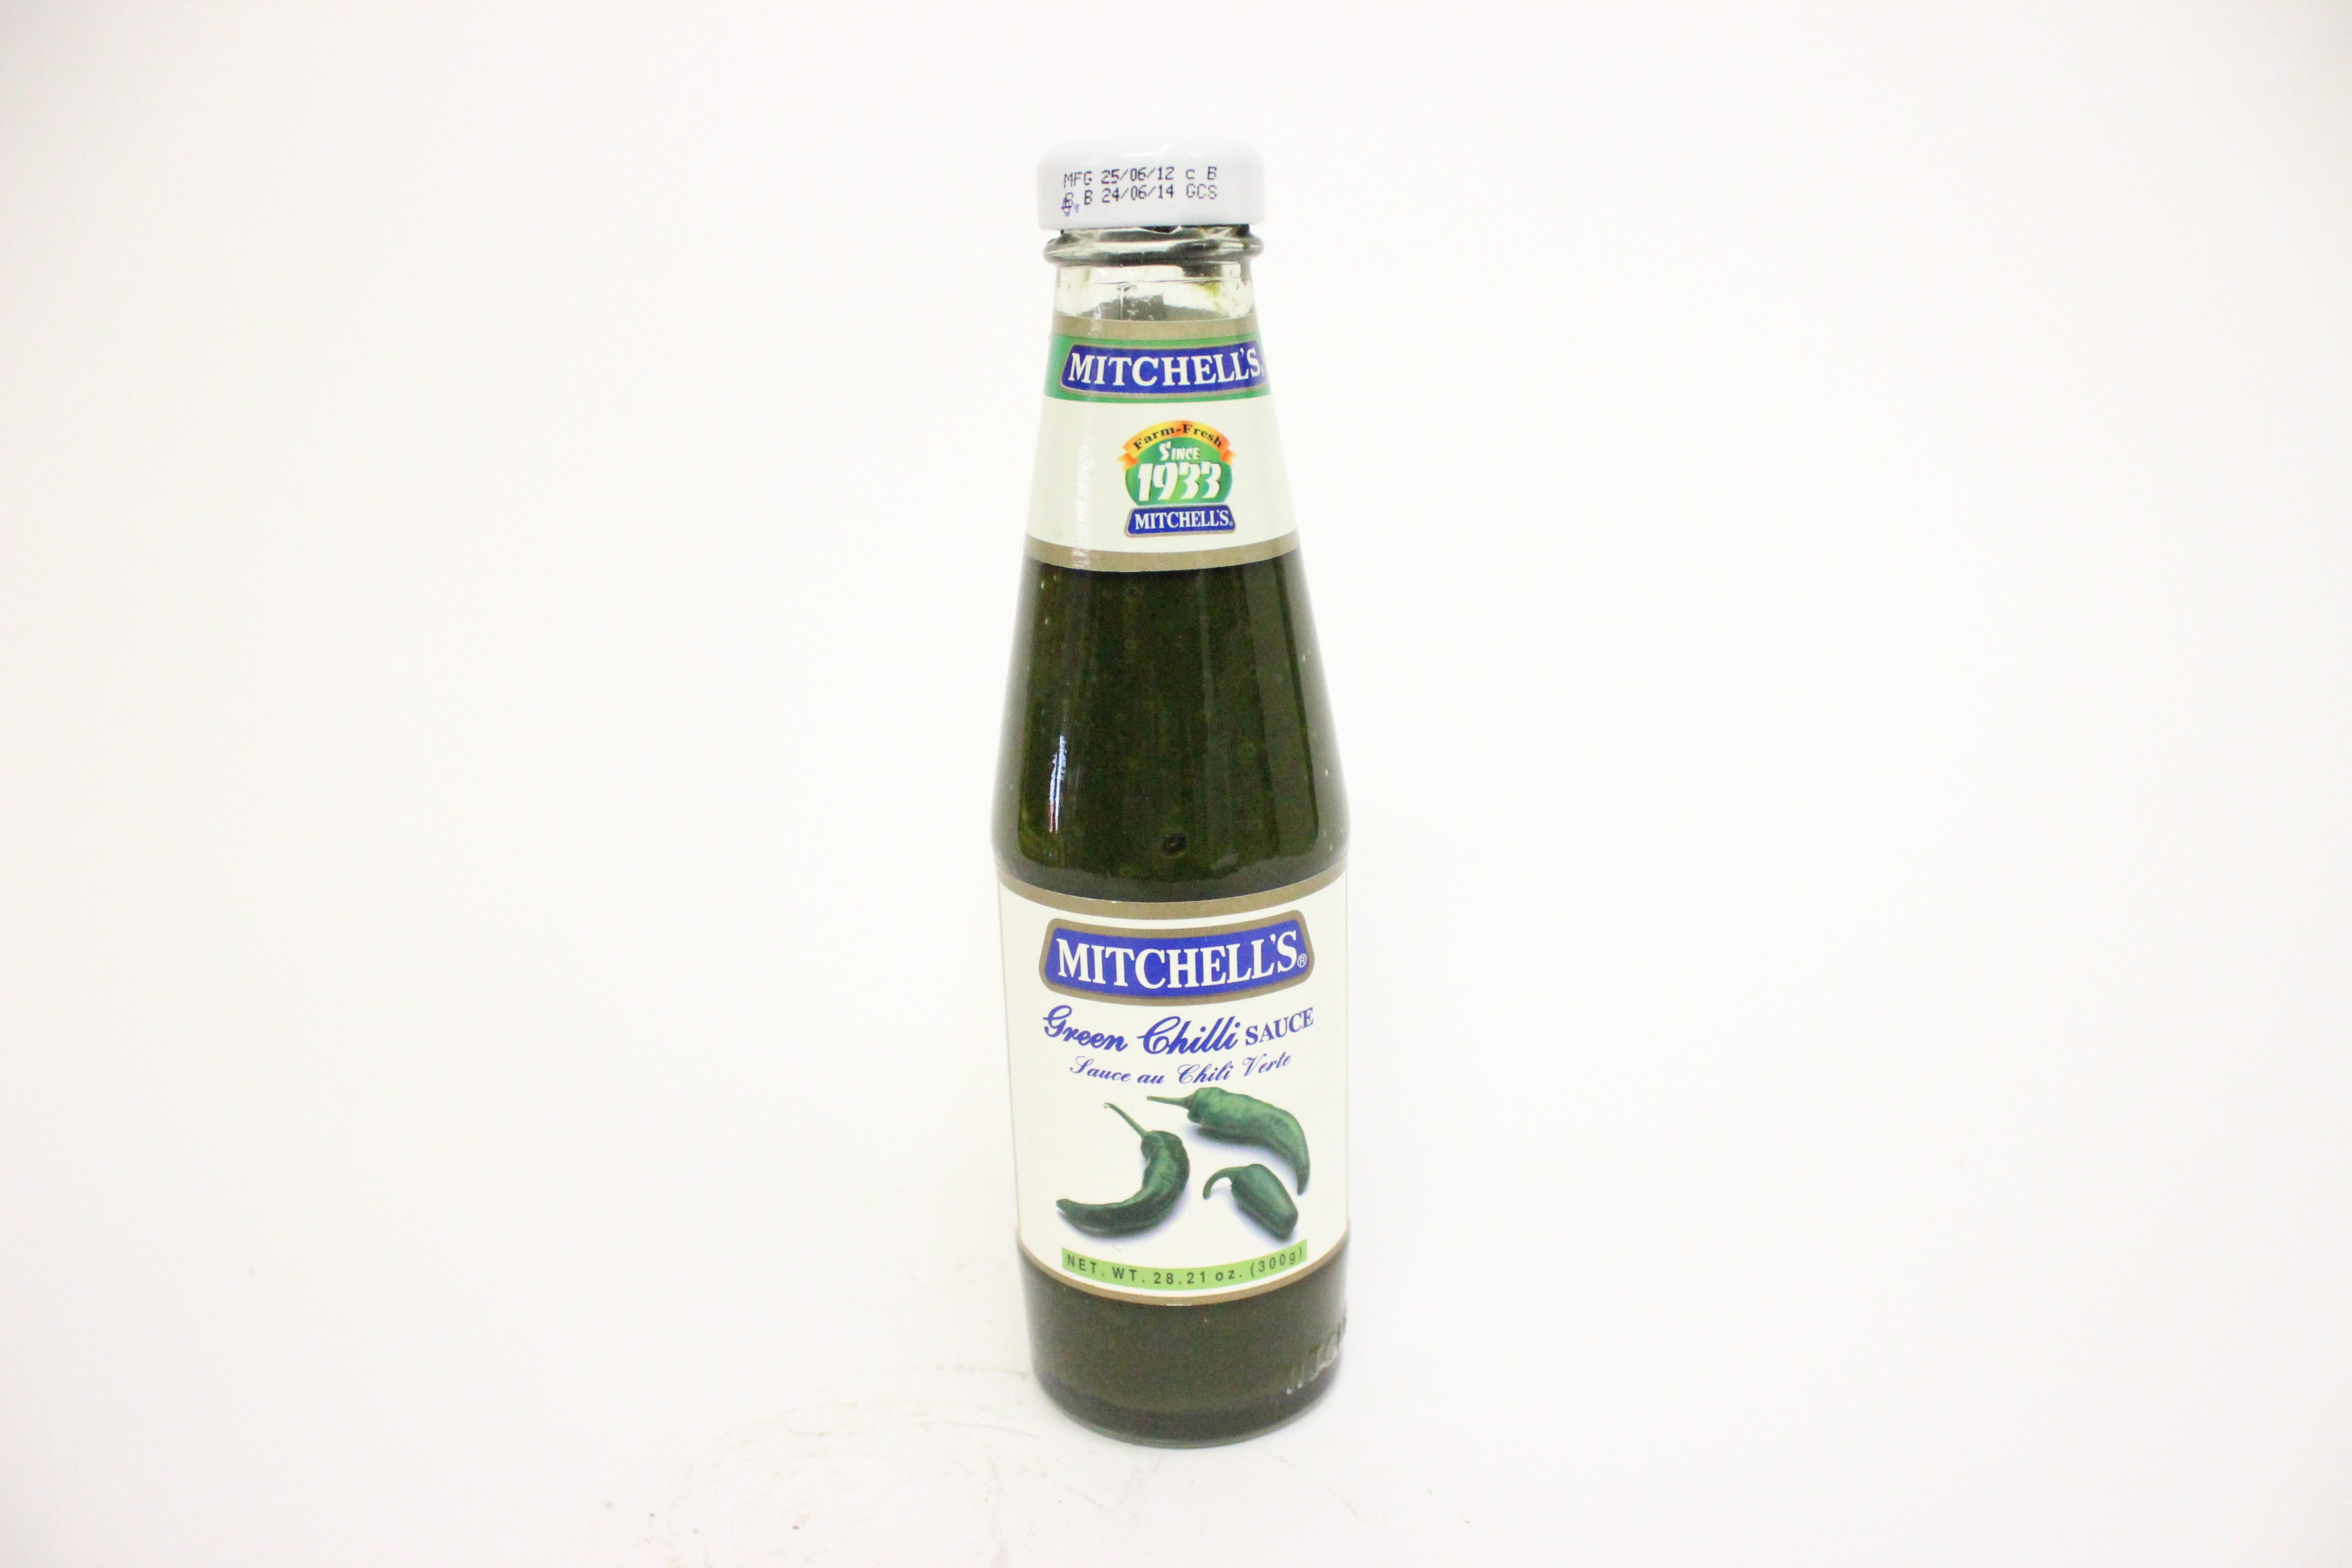 Mitchell's Green Chilli Sauce 28.21 oz